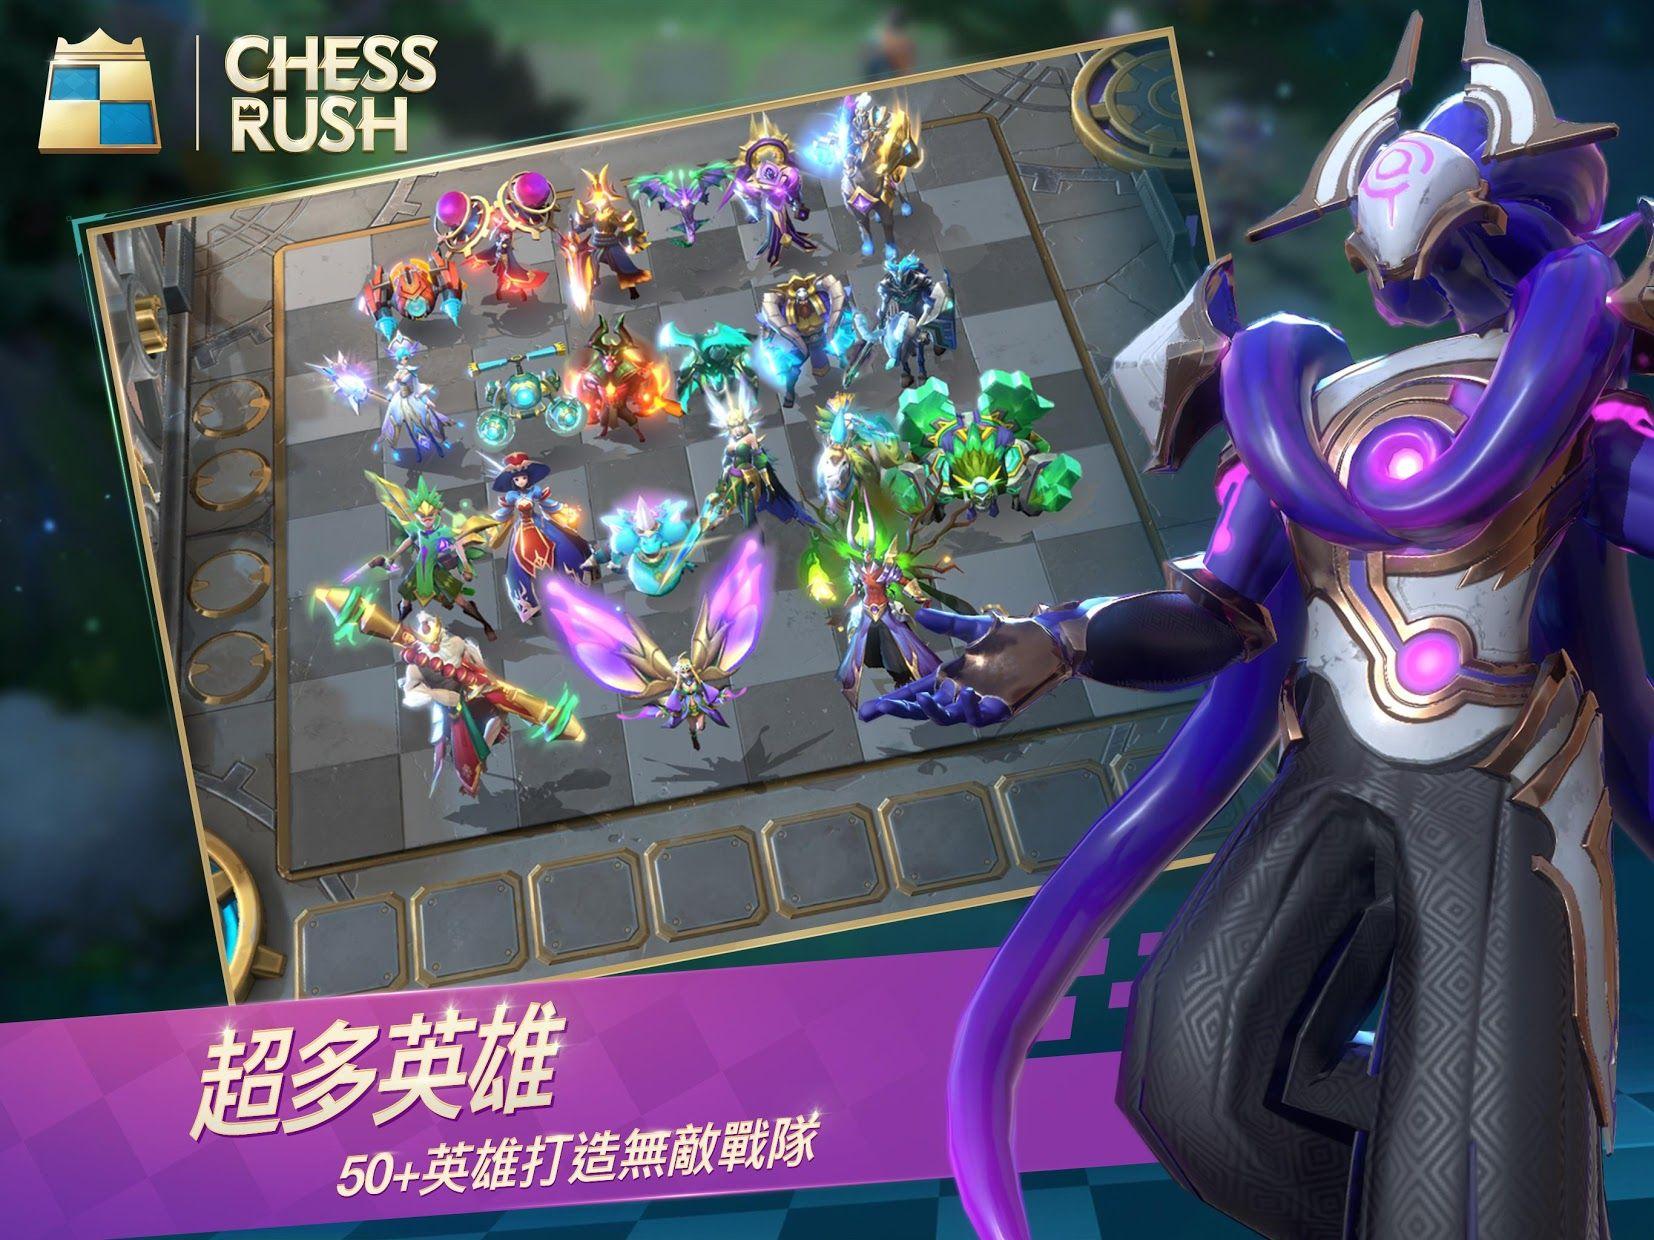 《Chess Rush》高等级英雄获取攻略